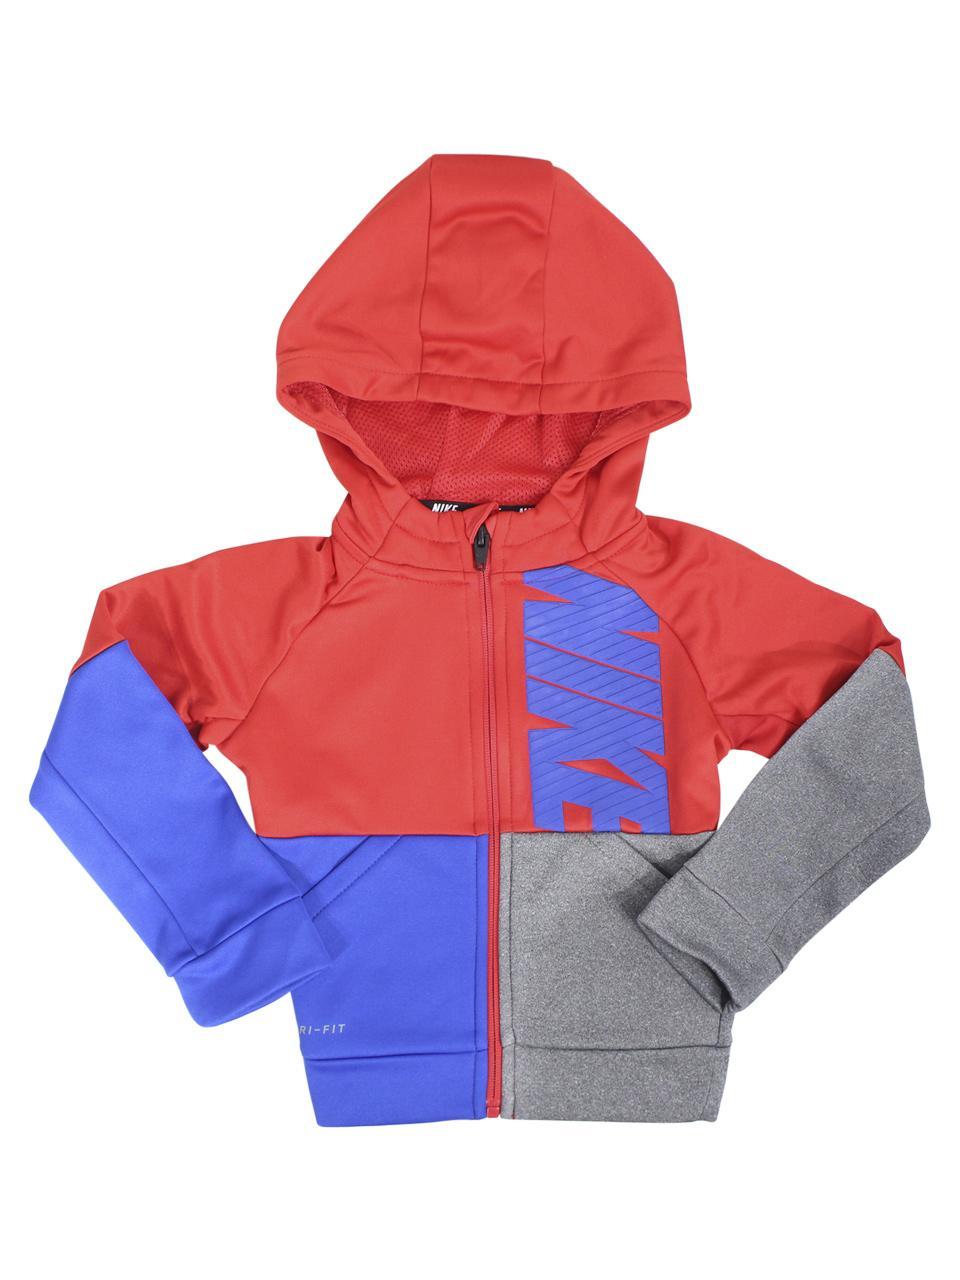 Nike Toddler Boy's Therma Zip Front Hooded Sweatshirt